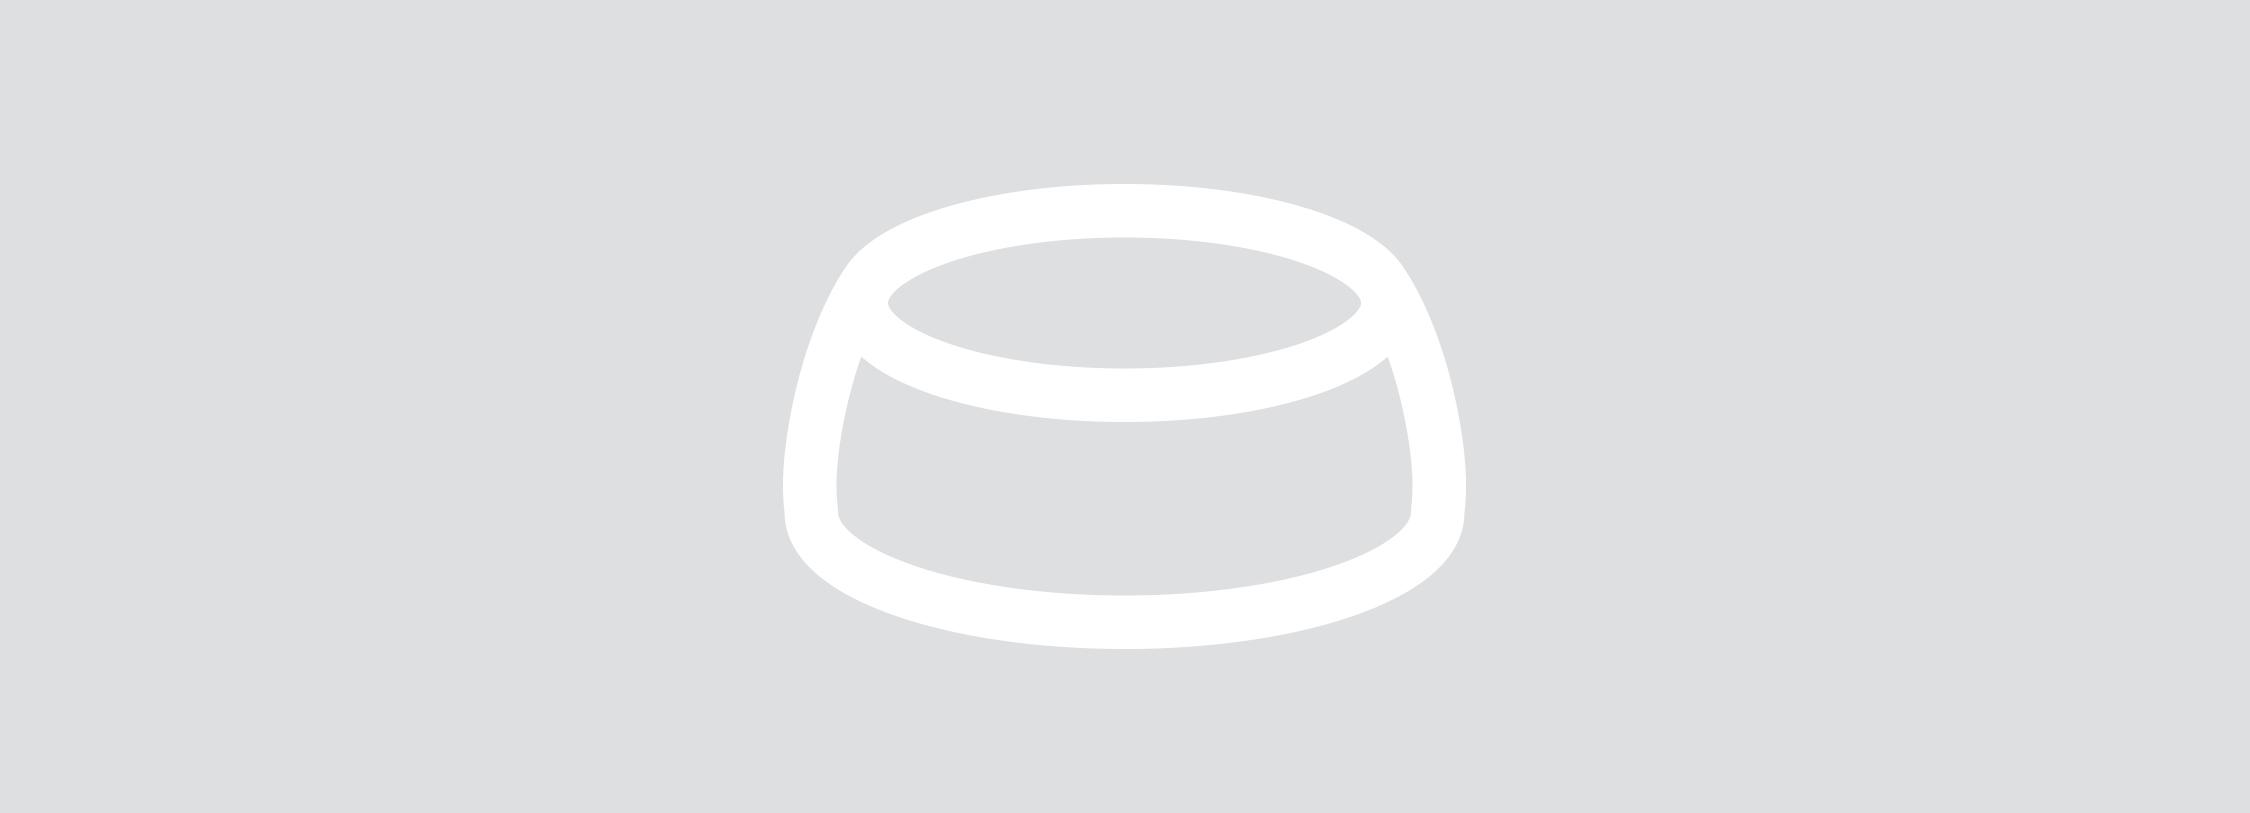 CBD Gummy Icon